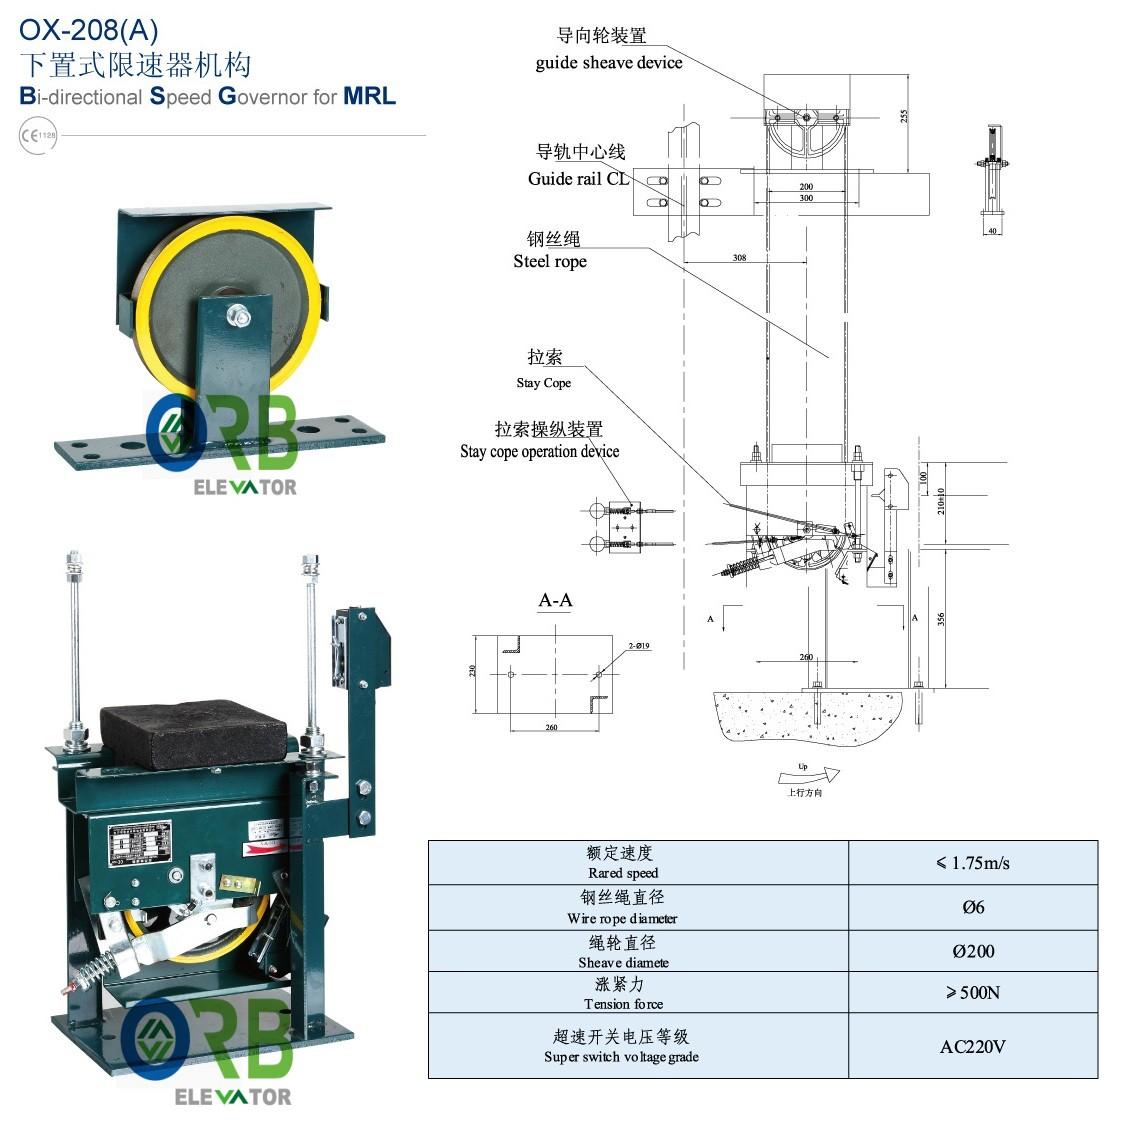 Elevator Governor Diagram Trusted Wiring Diagrams Schematic Find U2022 Shaft Design